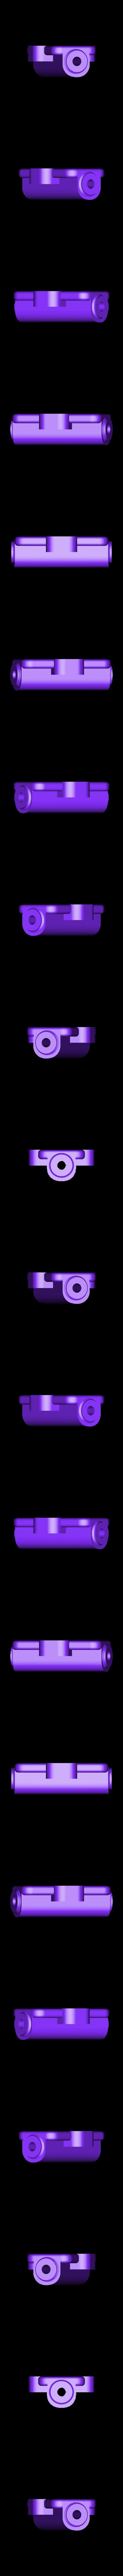 trailer_p4.stl Download free STL file Trailer • 3D printable model, _MSA_